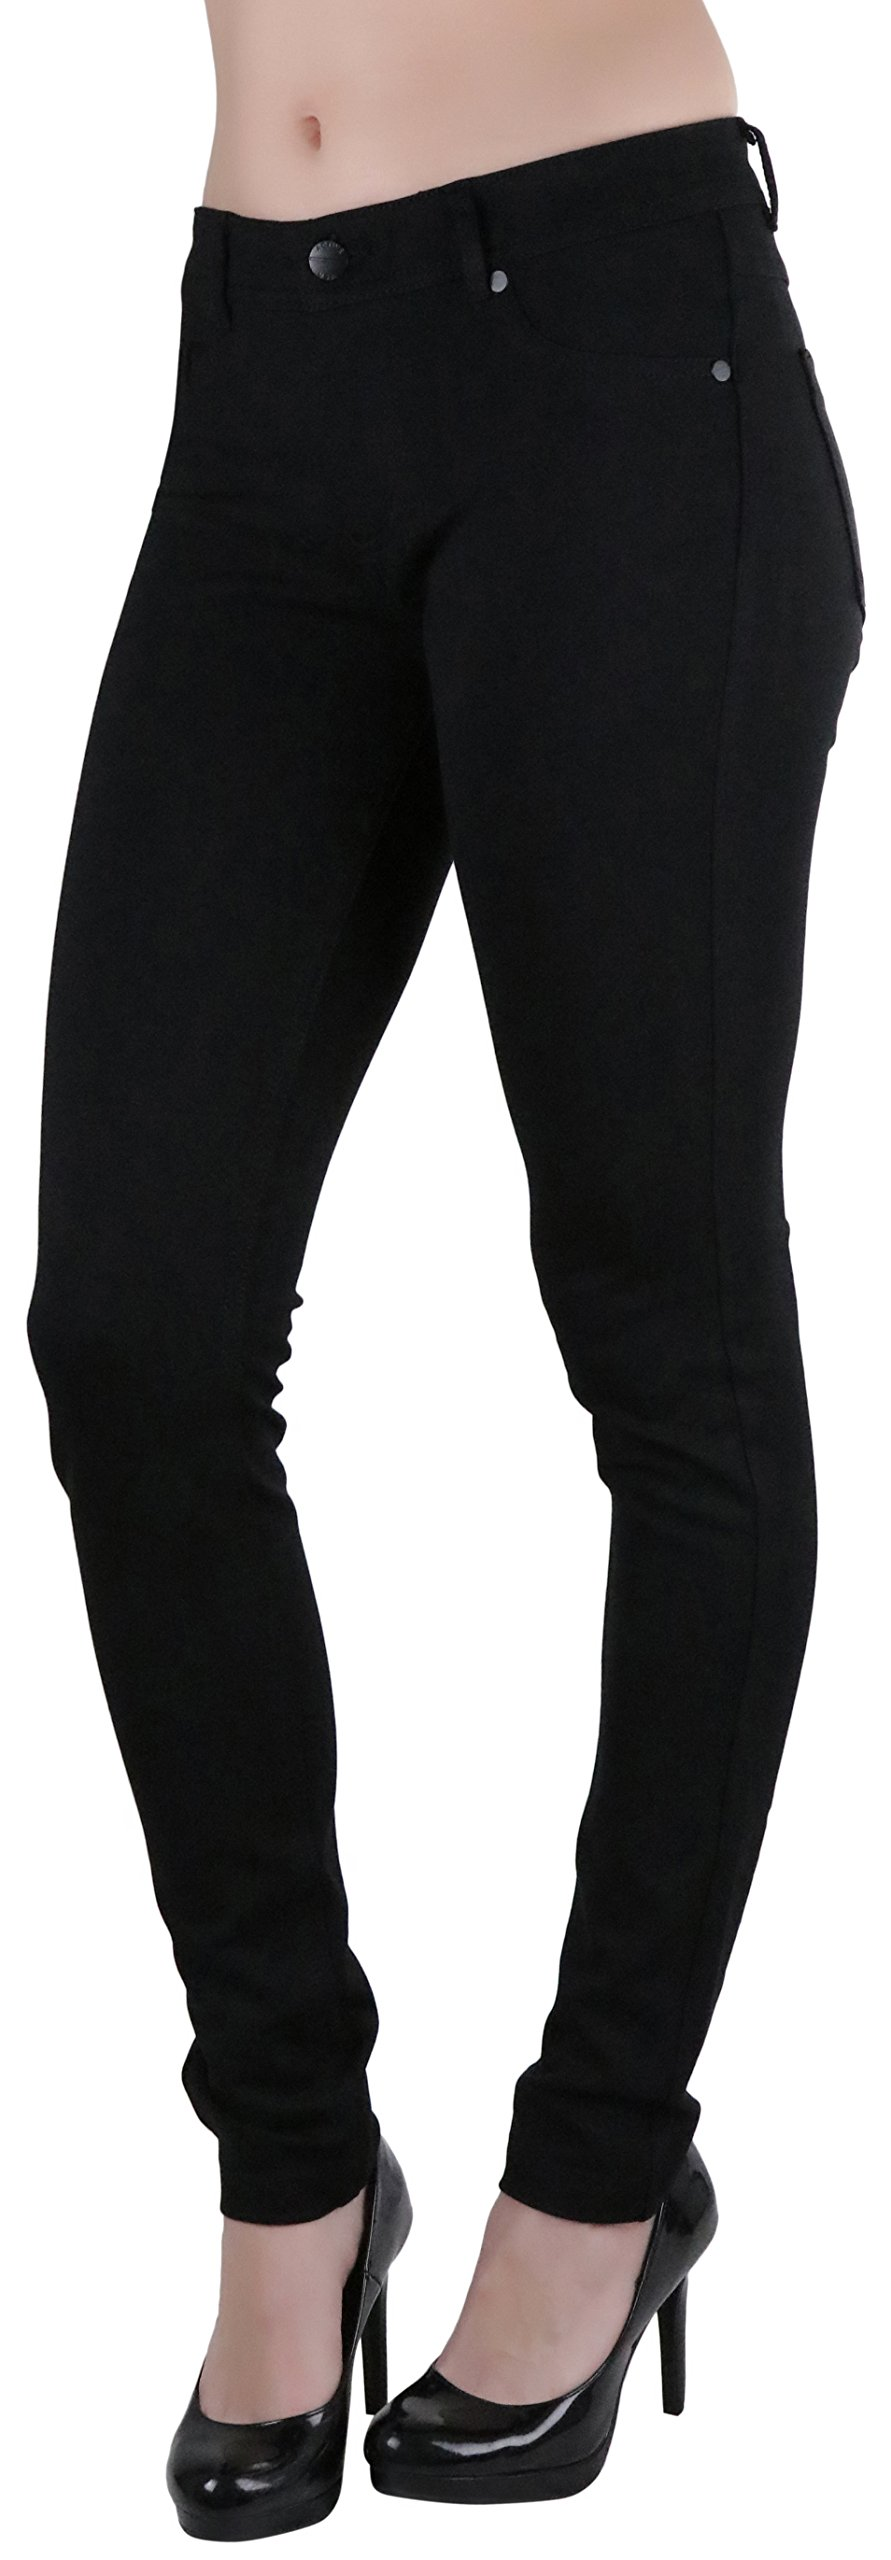 ToBeInStyle Women's Five Pocket Skinny Ponte Pants - Black - Large